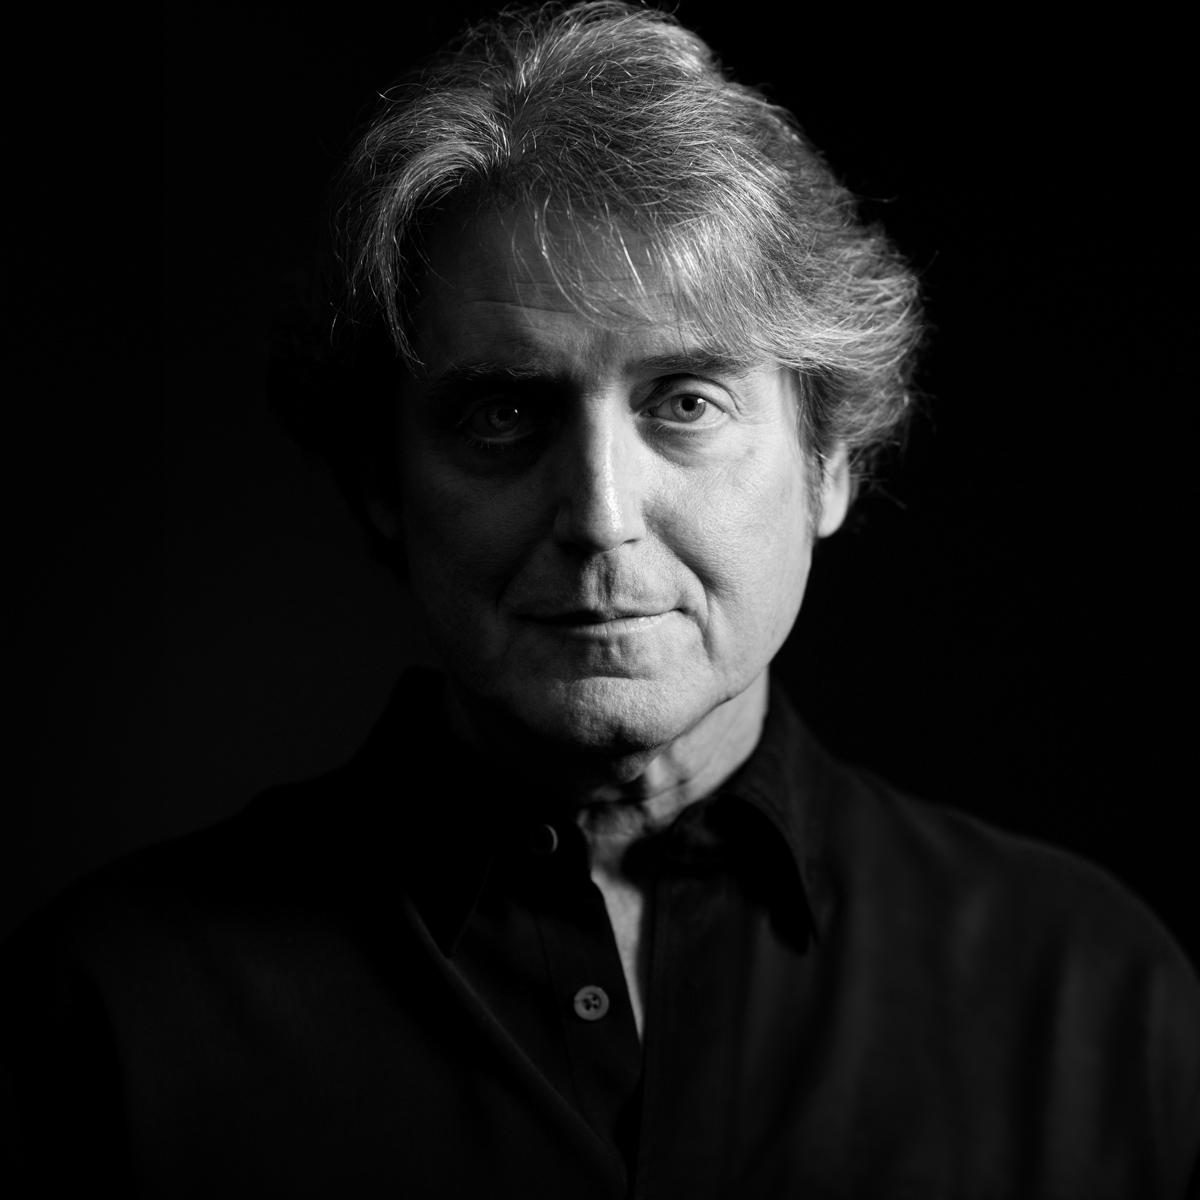 Chuck McDowell